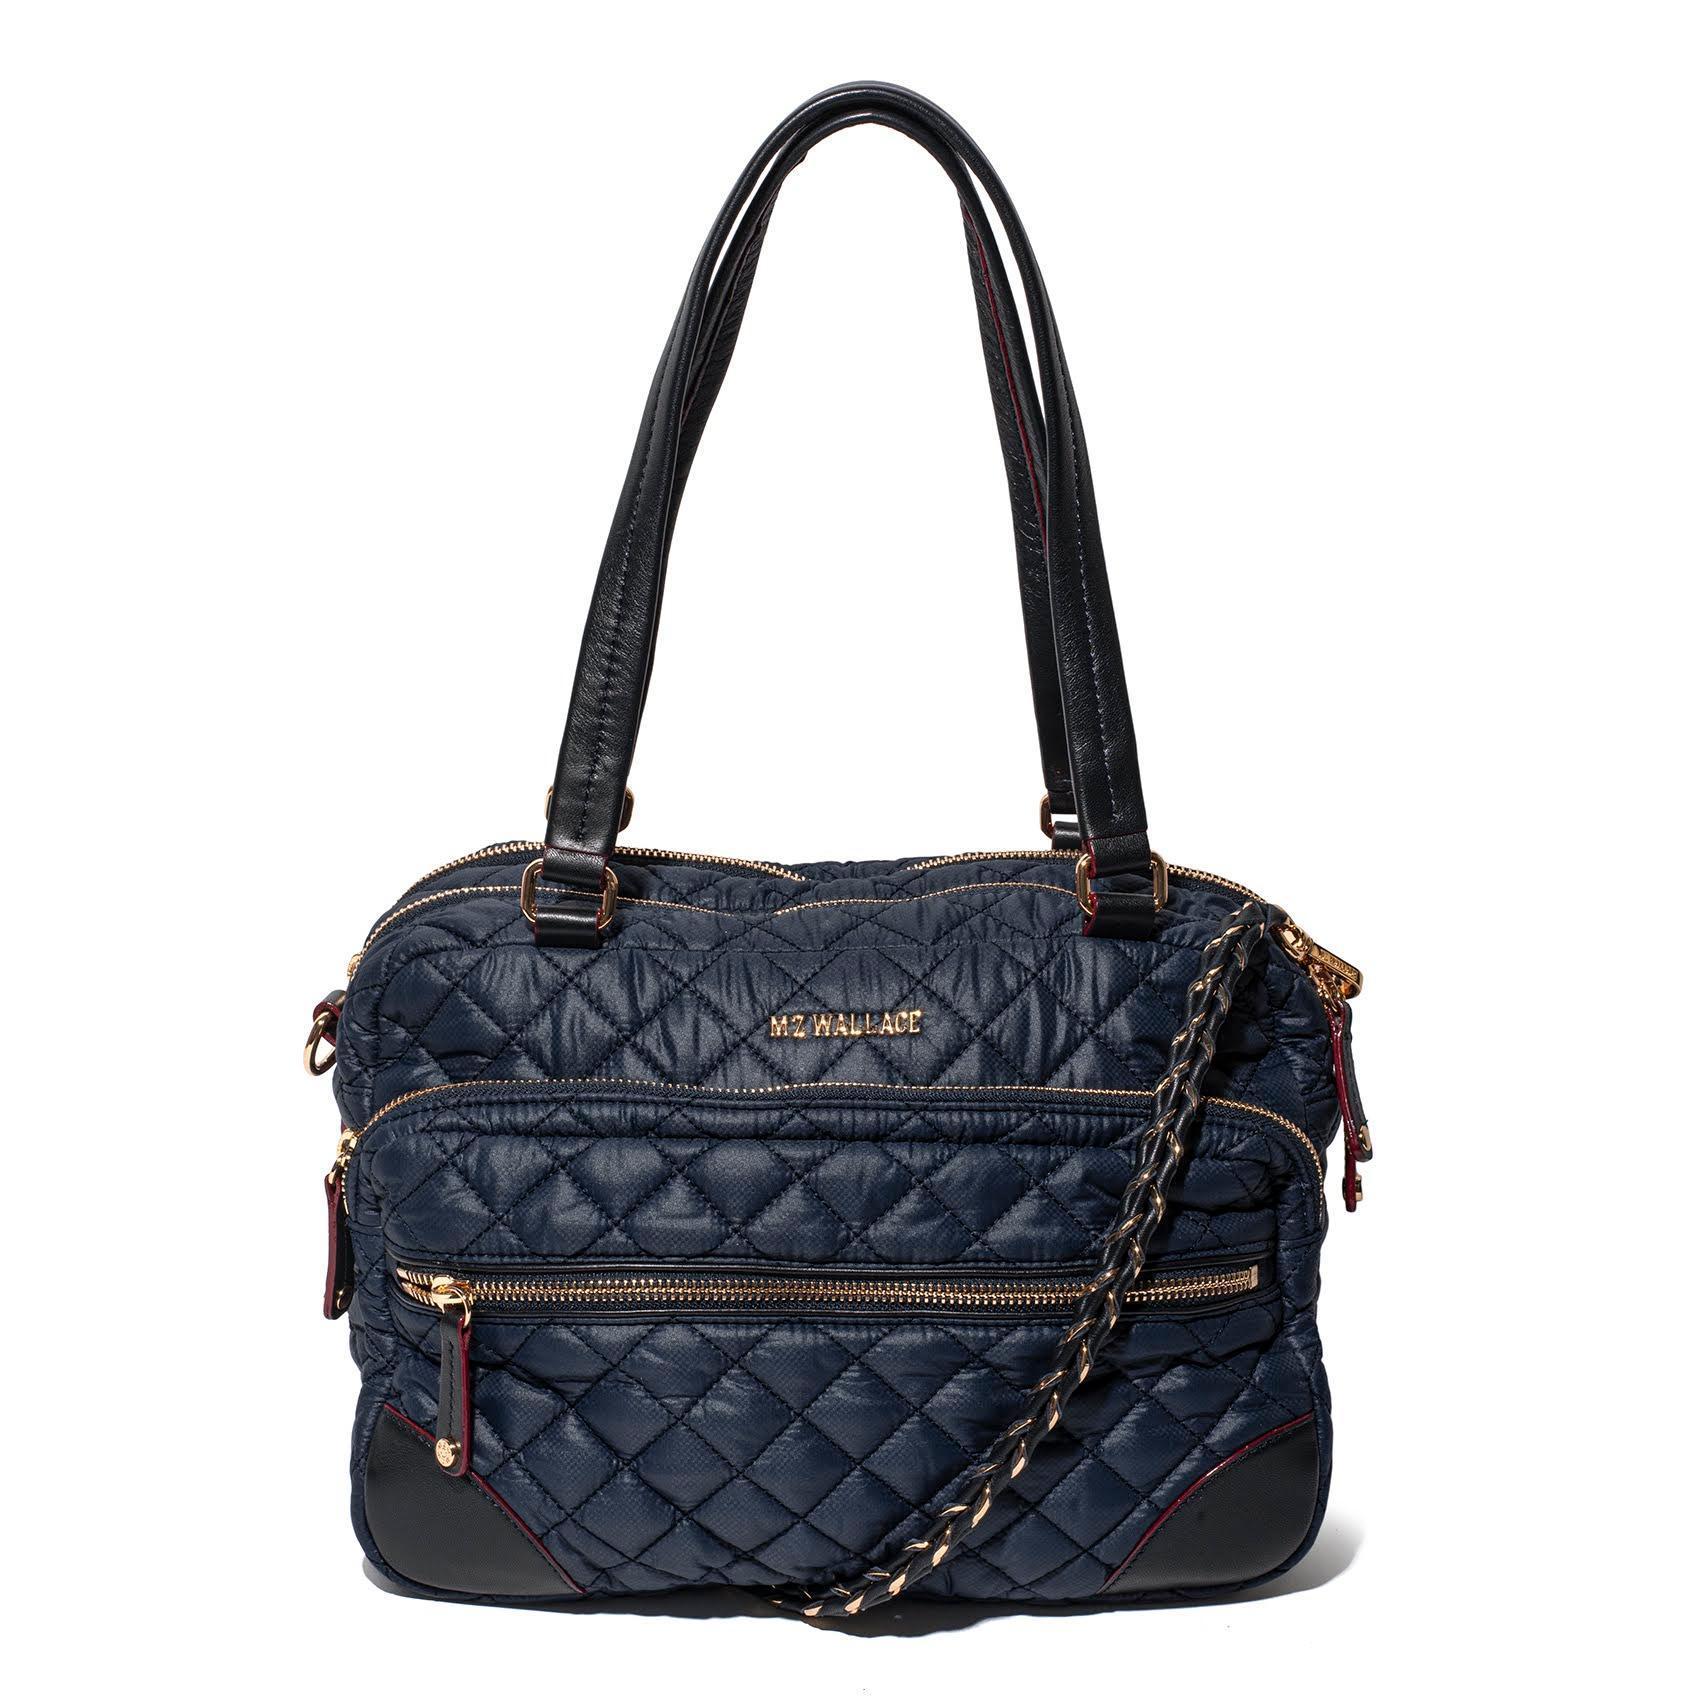 Mz Wallace Crosby Quilted Handbag